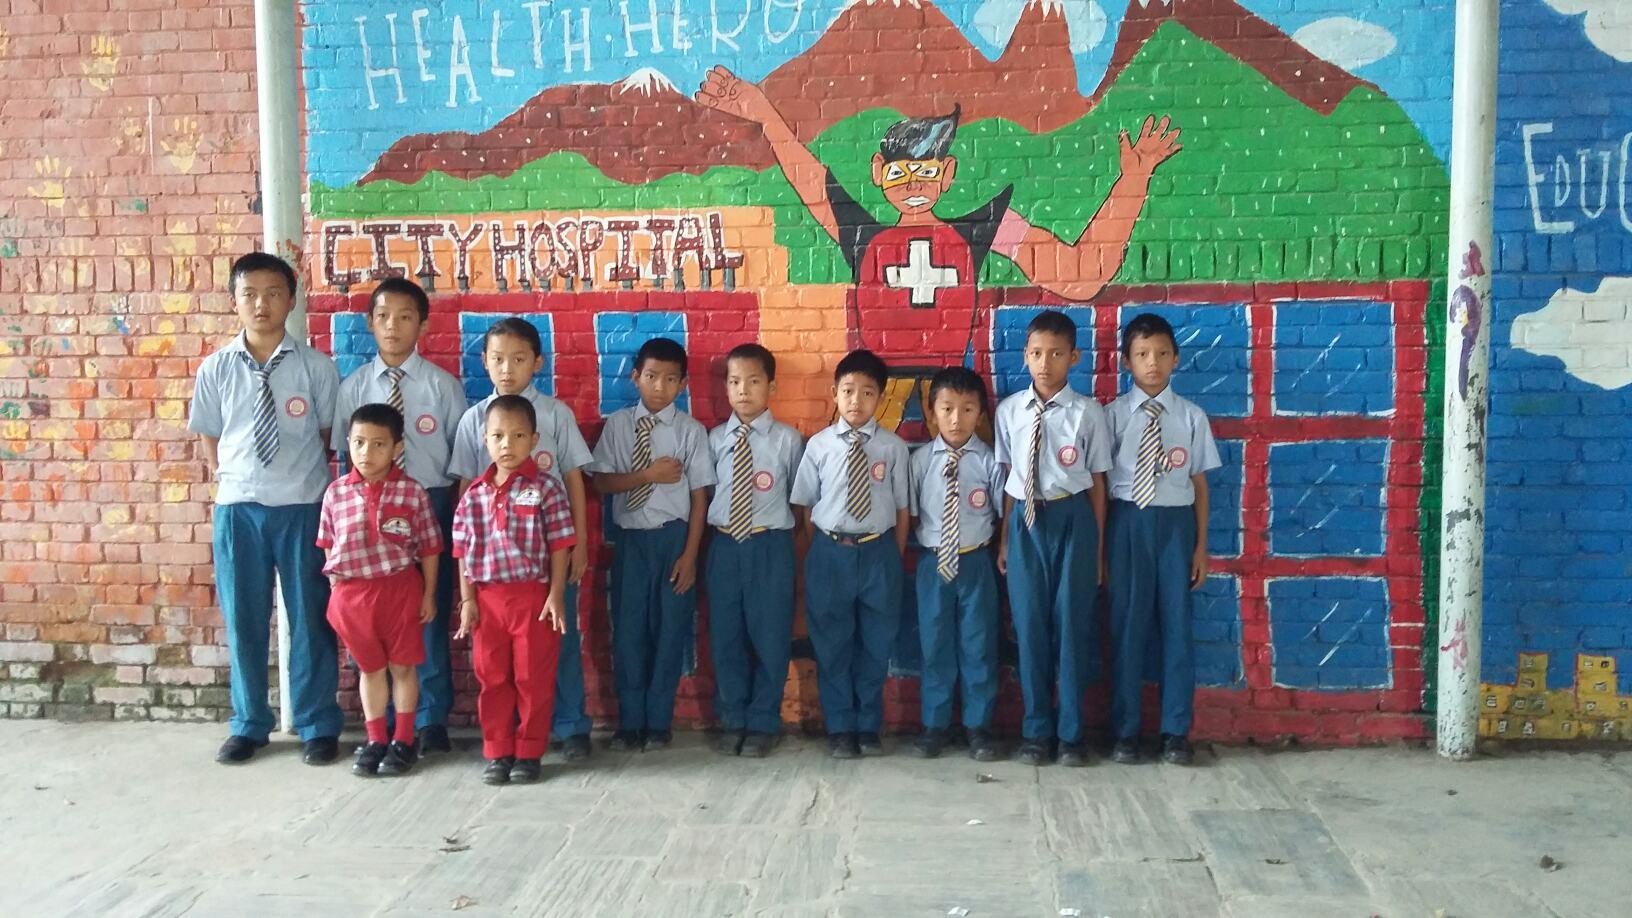 12 new students in school uniform 092215.jpg